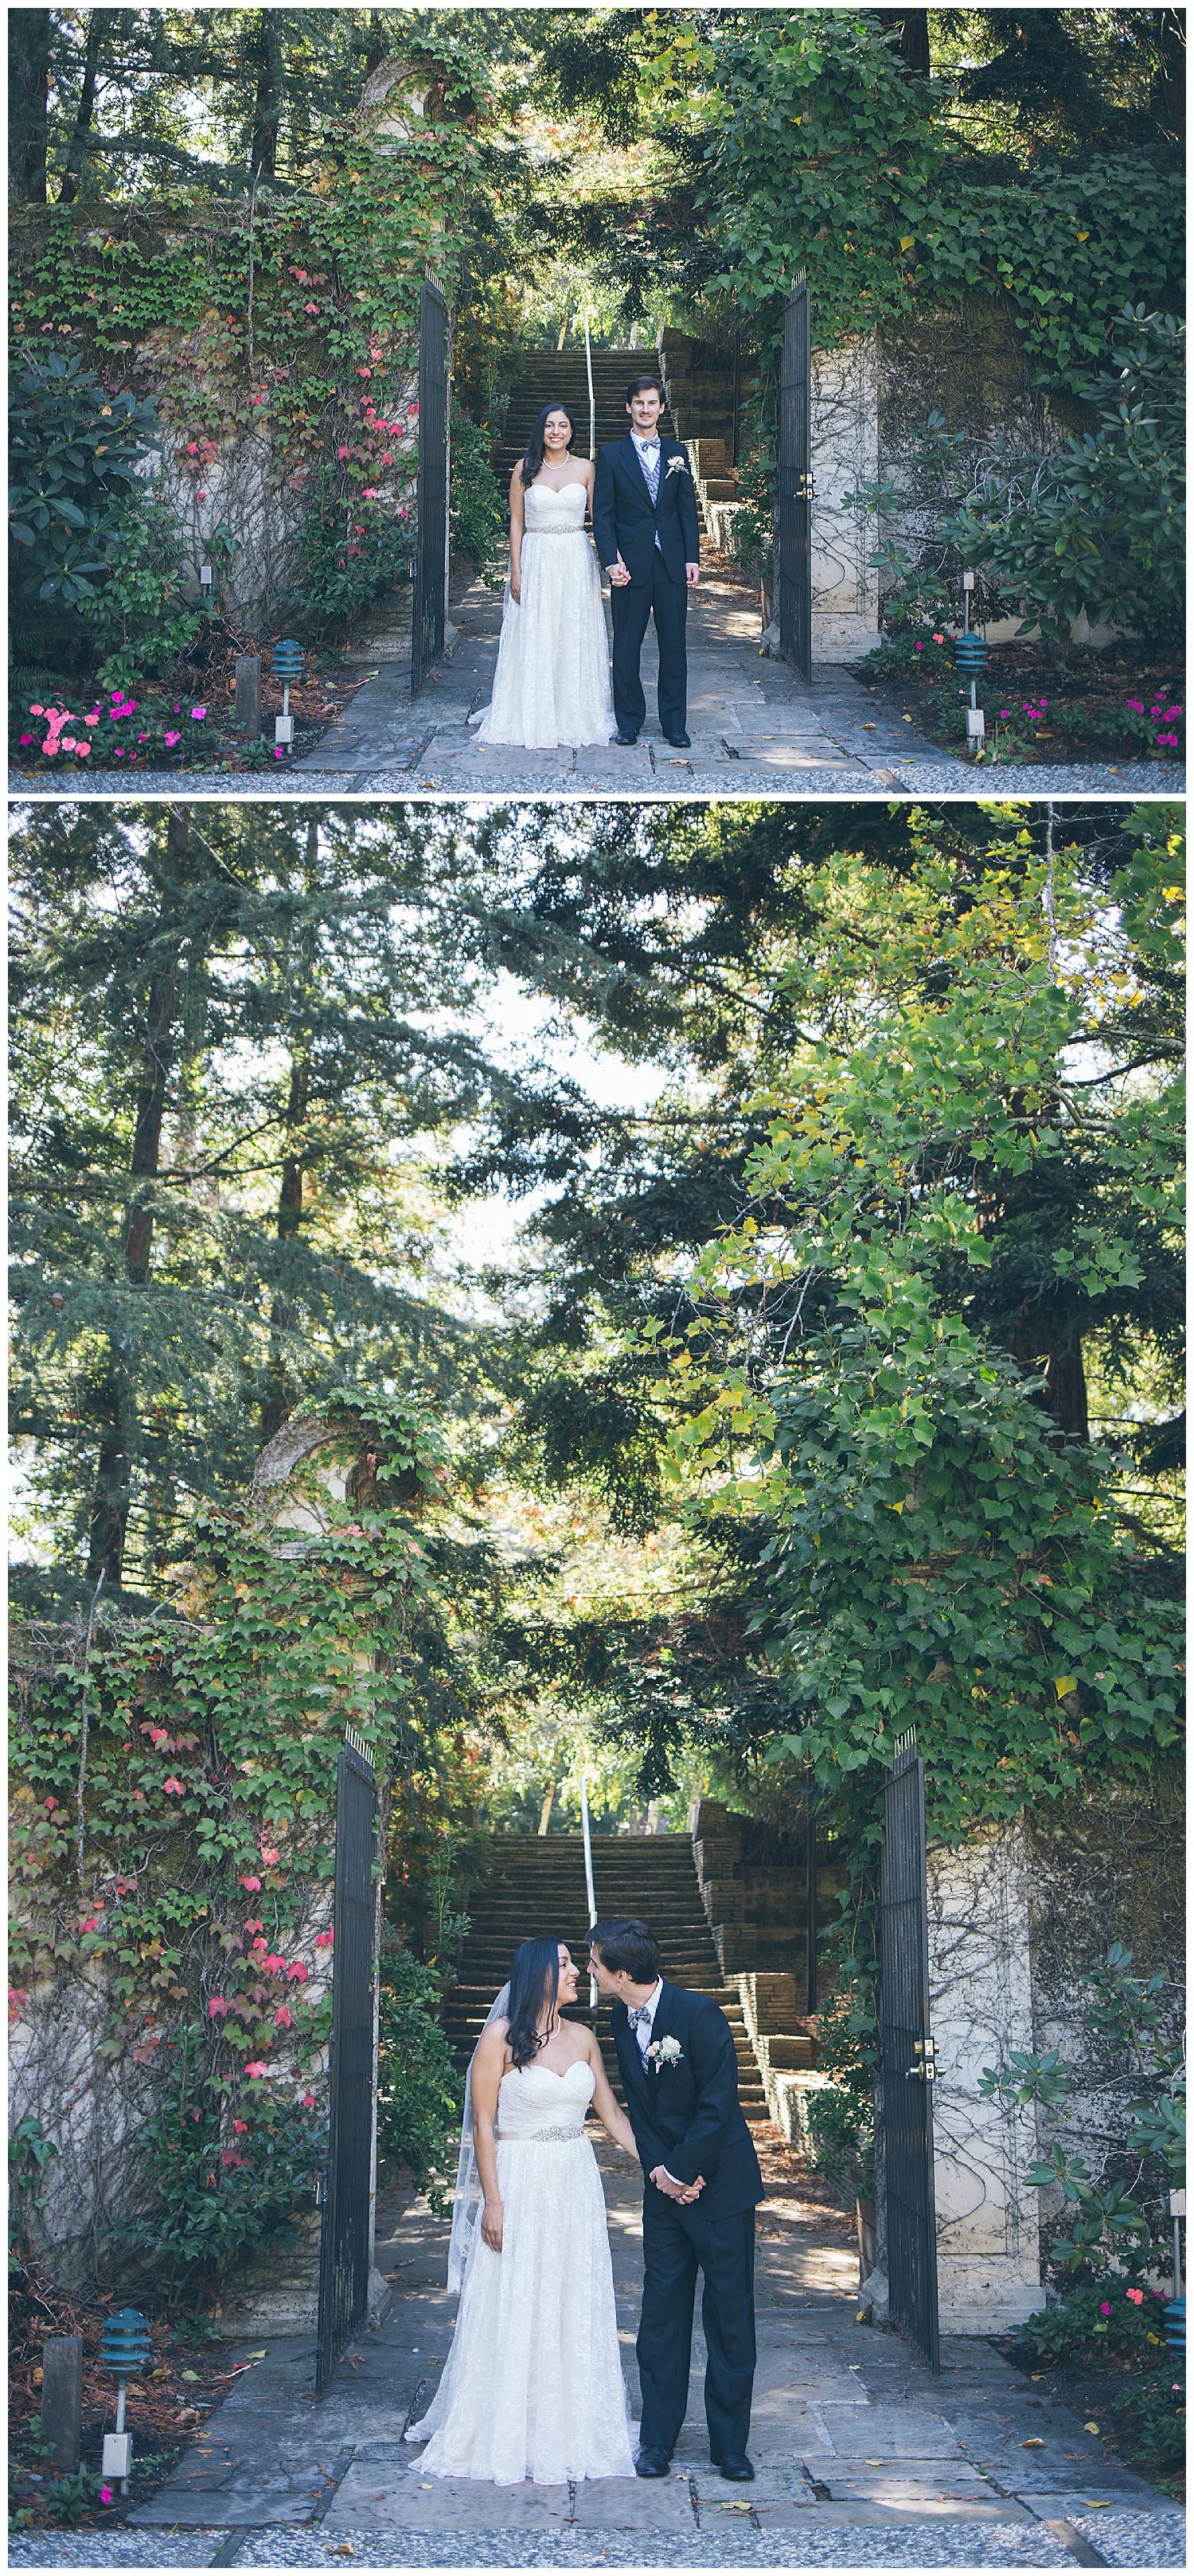 khariza-rae-photography-bay-area-wedding-photographer_0165.jpg